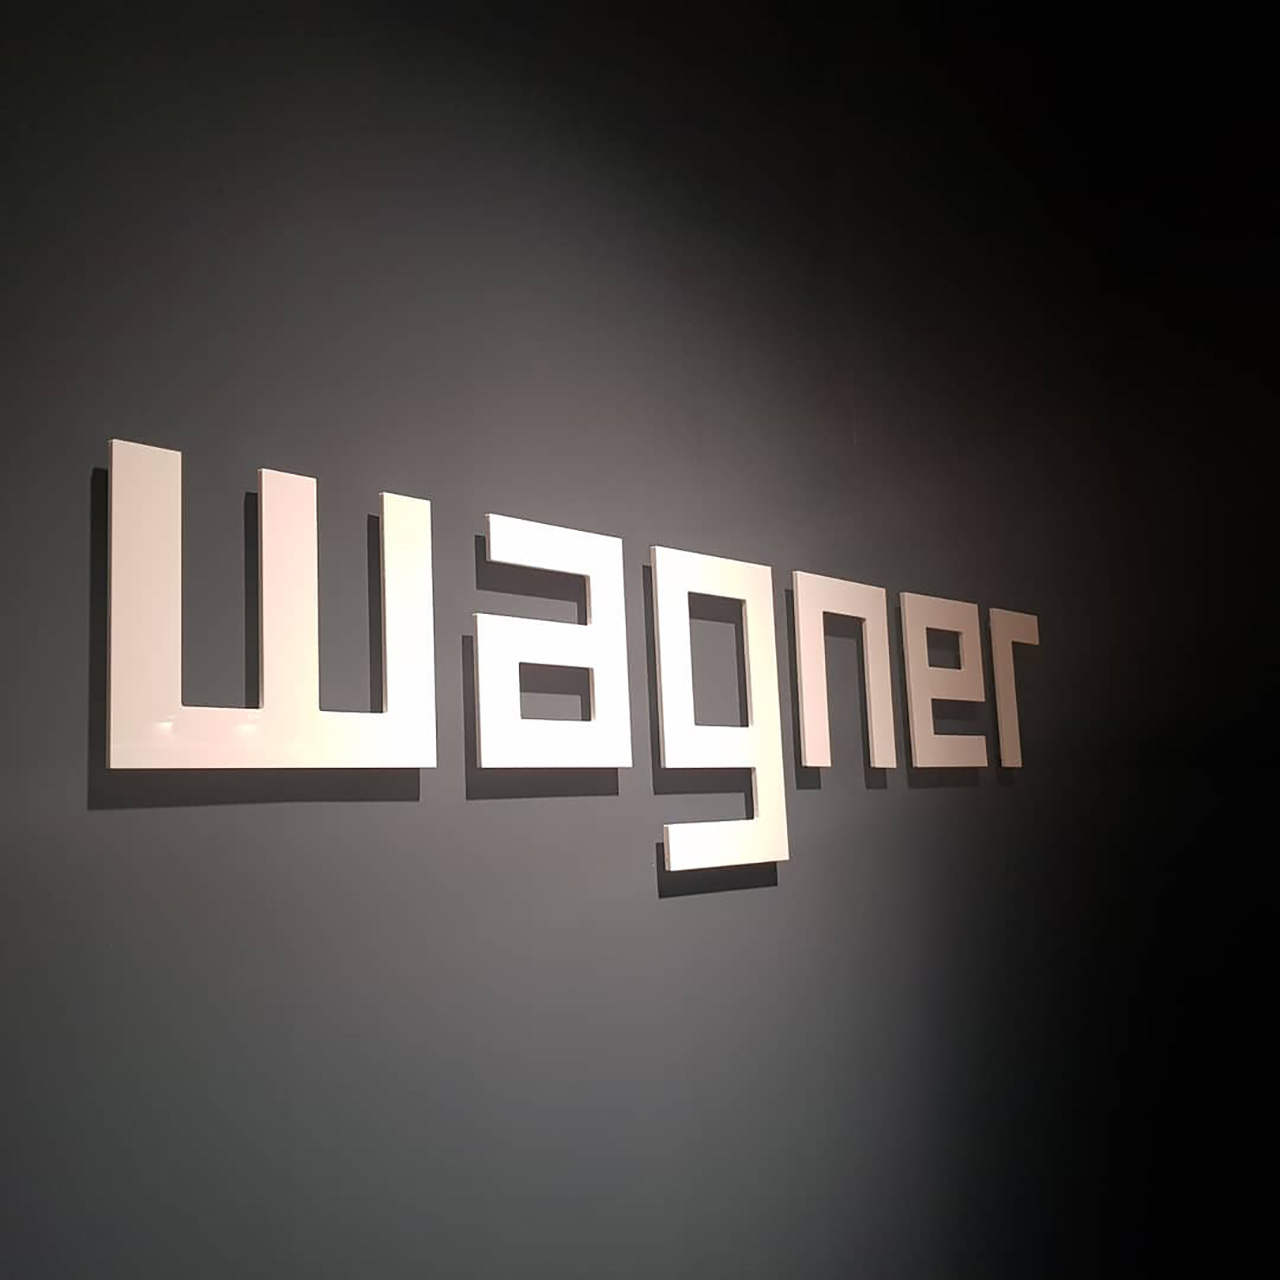 Einzelbuchstaben aus Acrylox Material - Firmenlogo in 3D-Ausführung